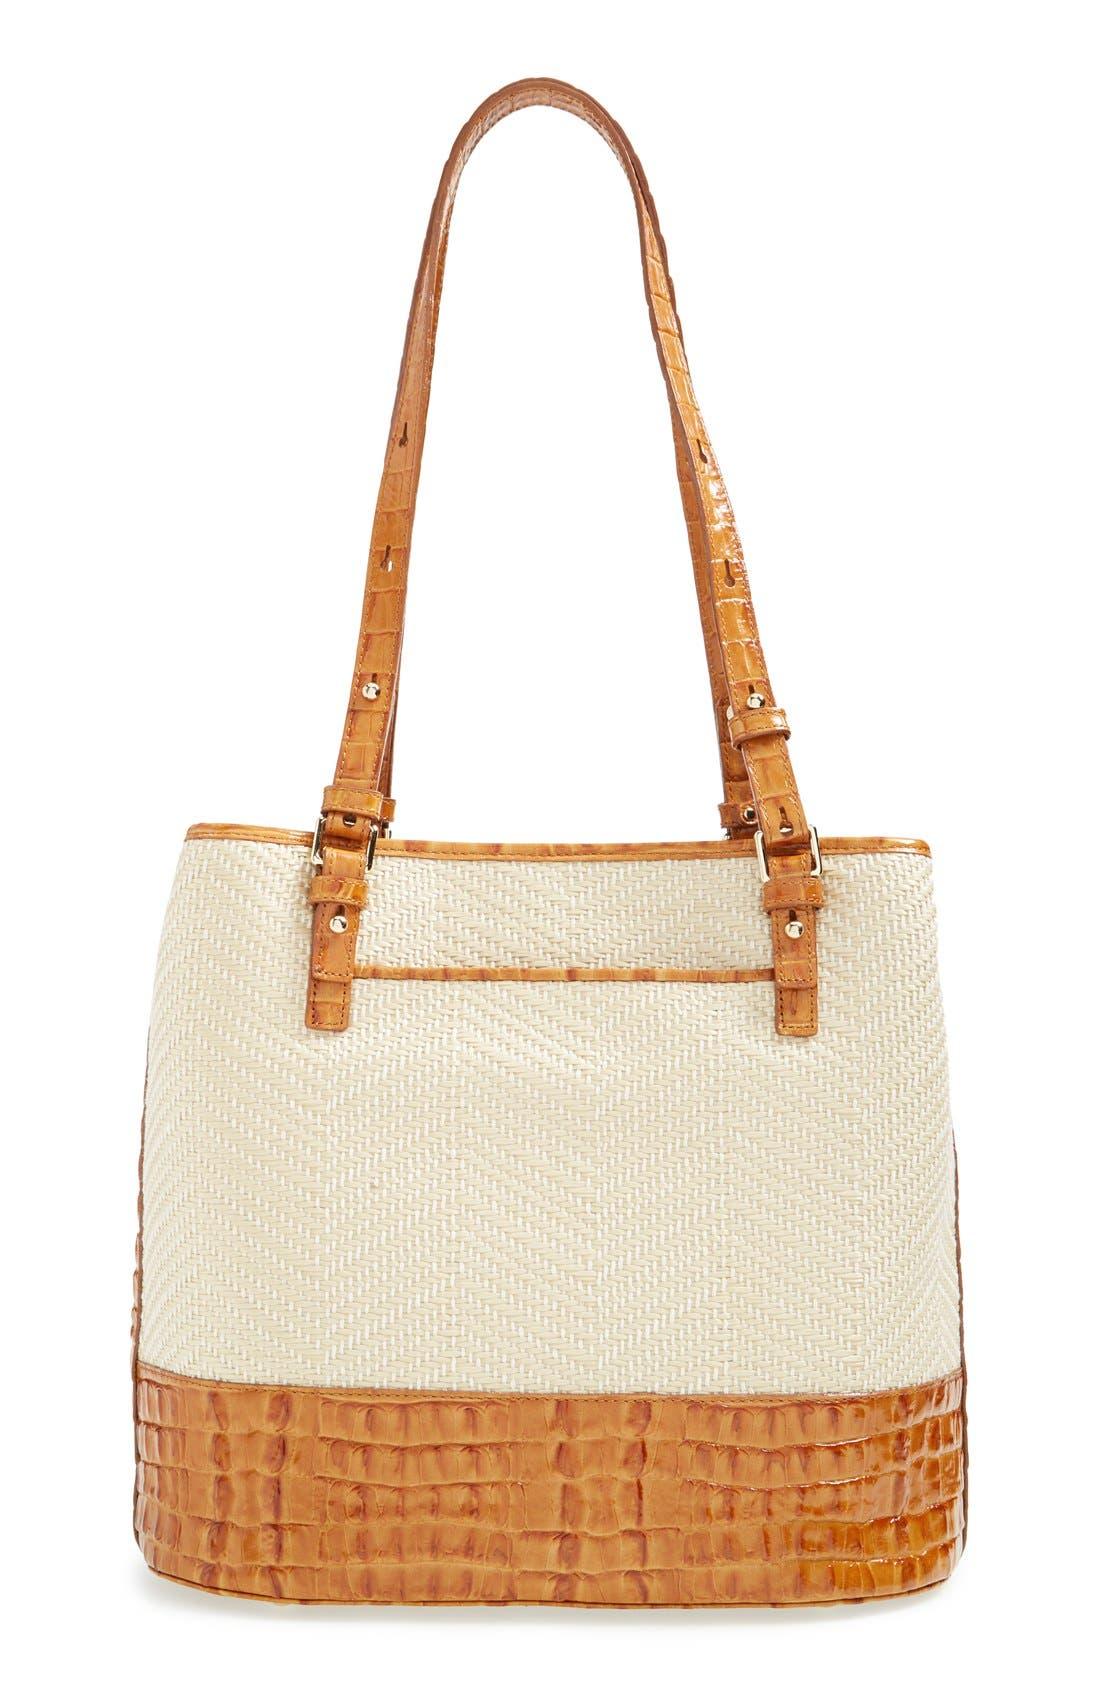 'Hudson' Leather & Raffia Bucket Bag,                             Alternate thumbnail 2, color,                             250